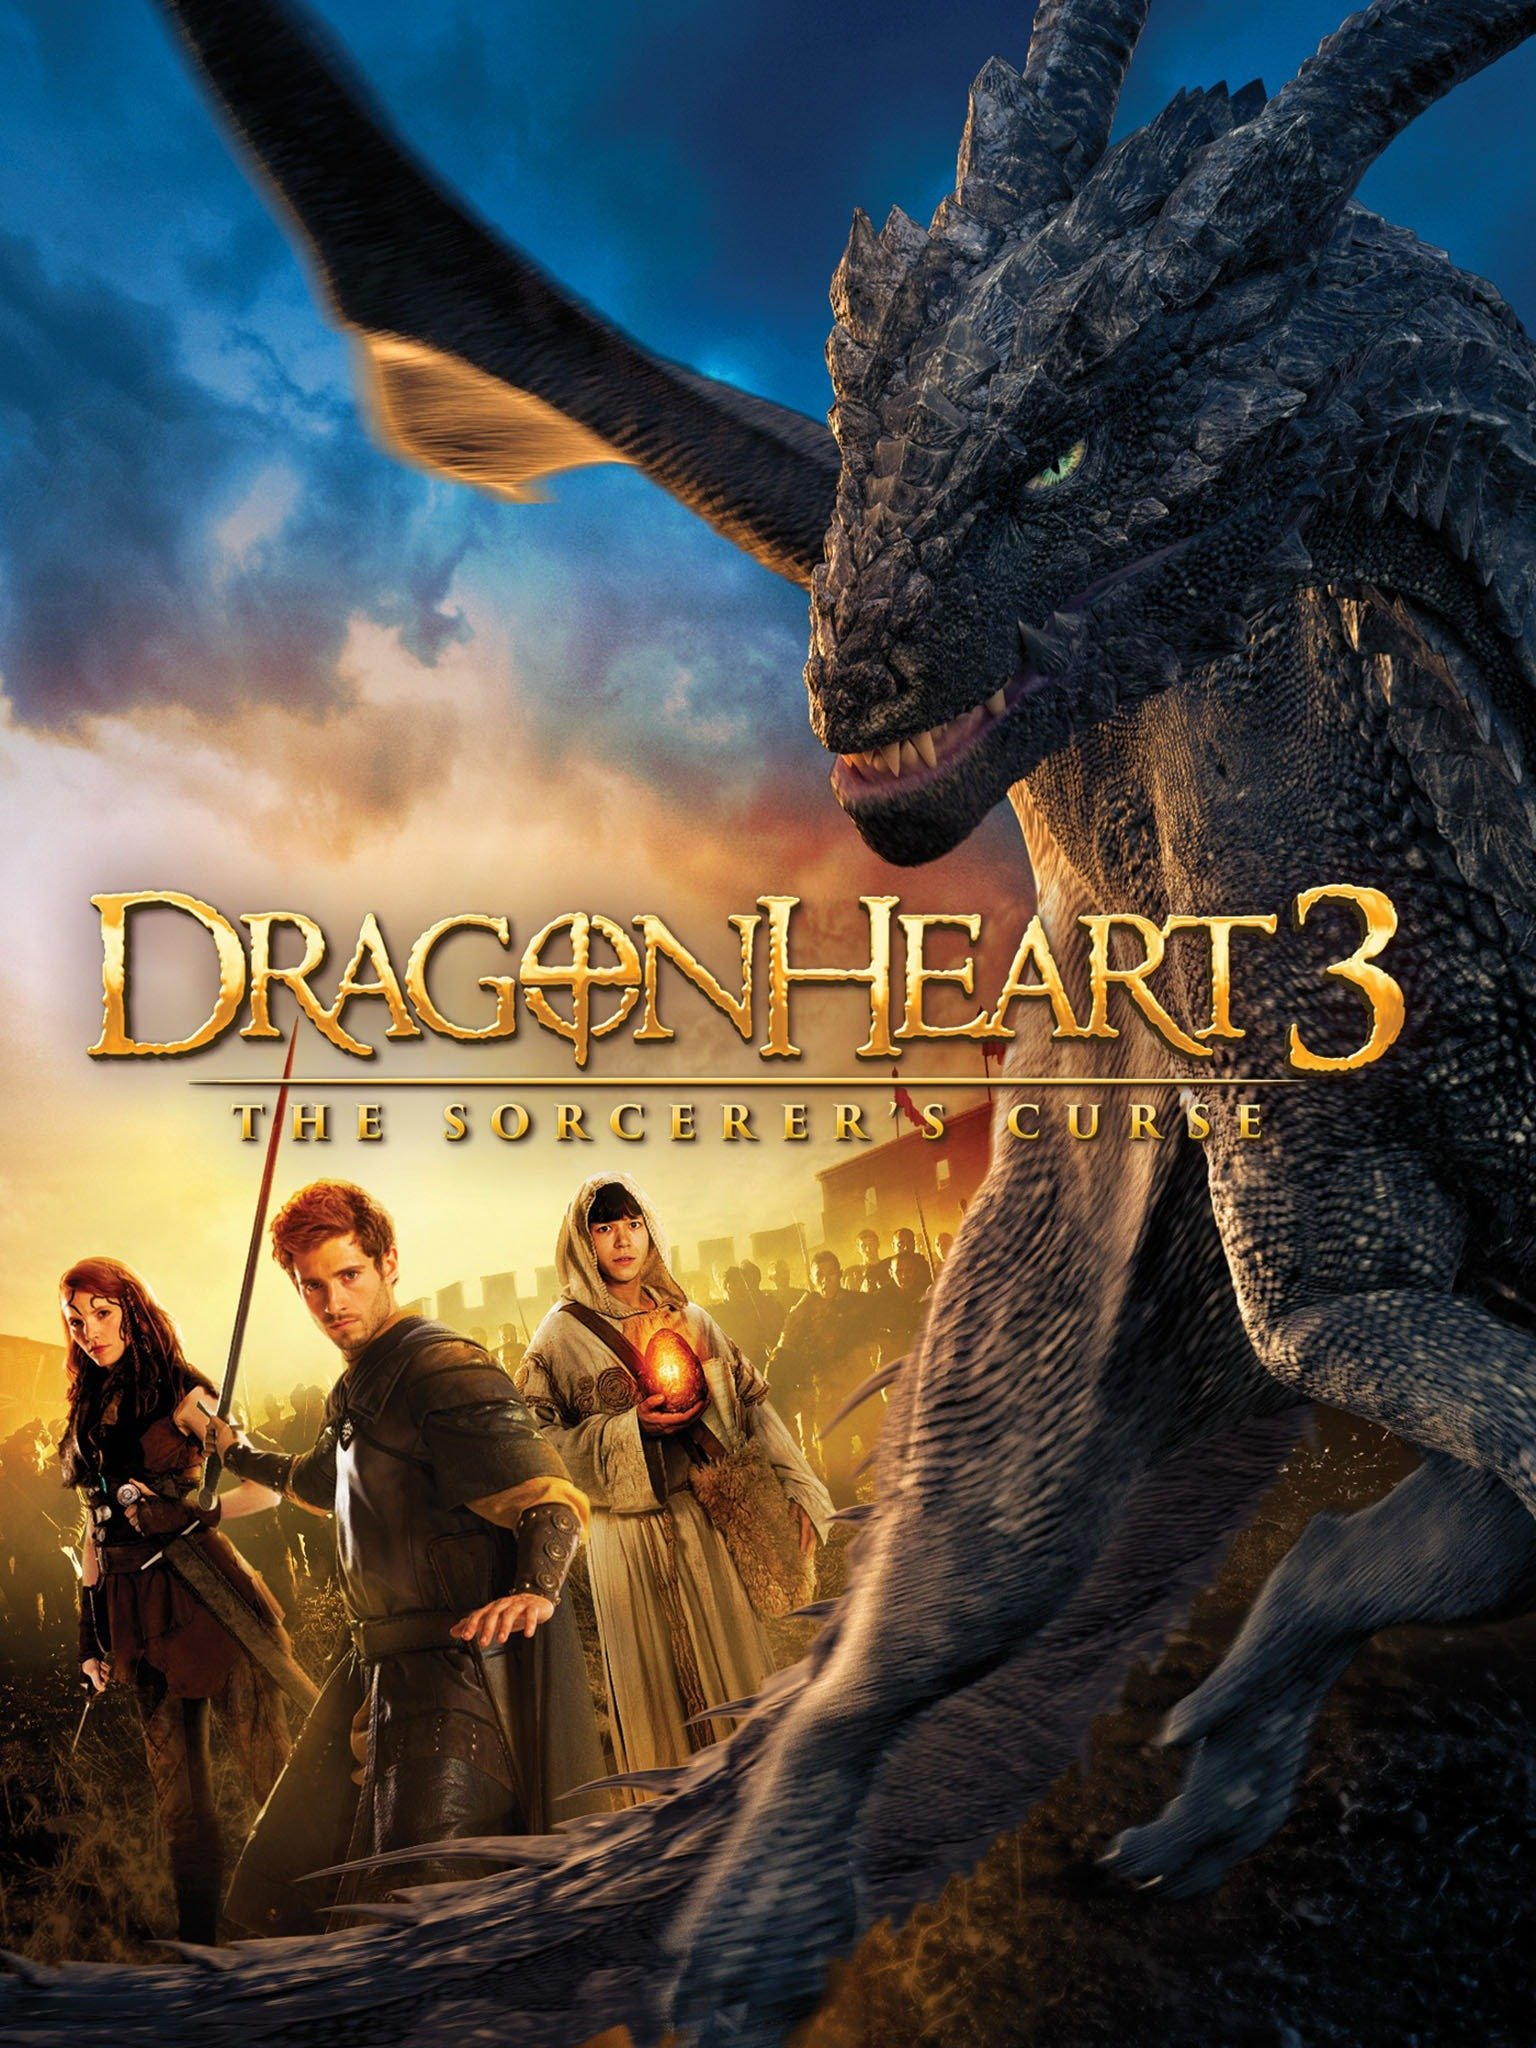 Dragonheart 3: The Sorcerer's Curse